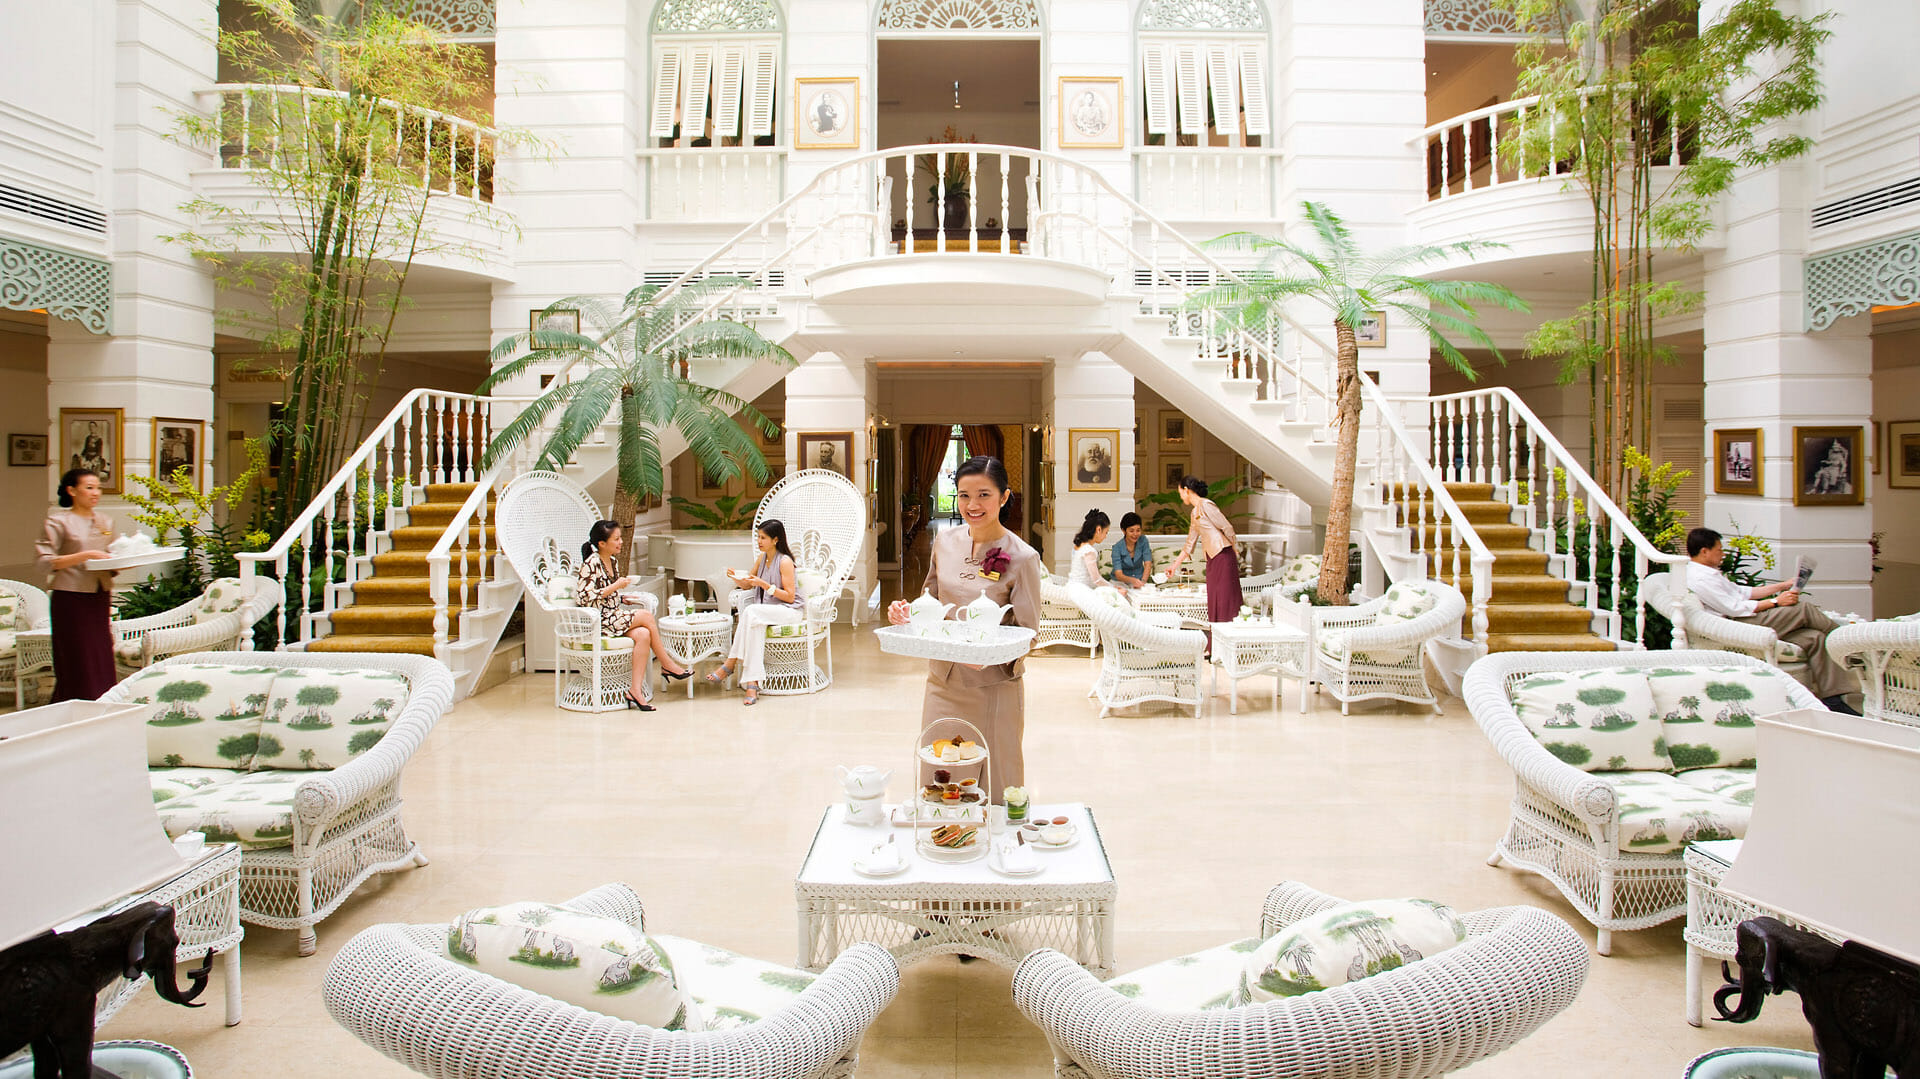 Mandarin Oriental Hotel - Top 20 best accommodations in Thailand